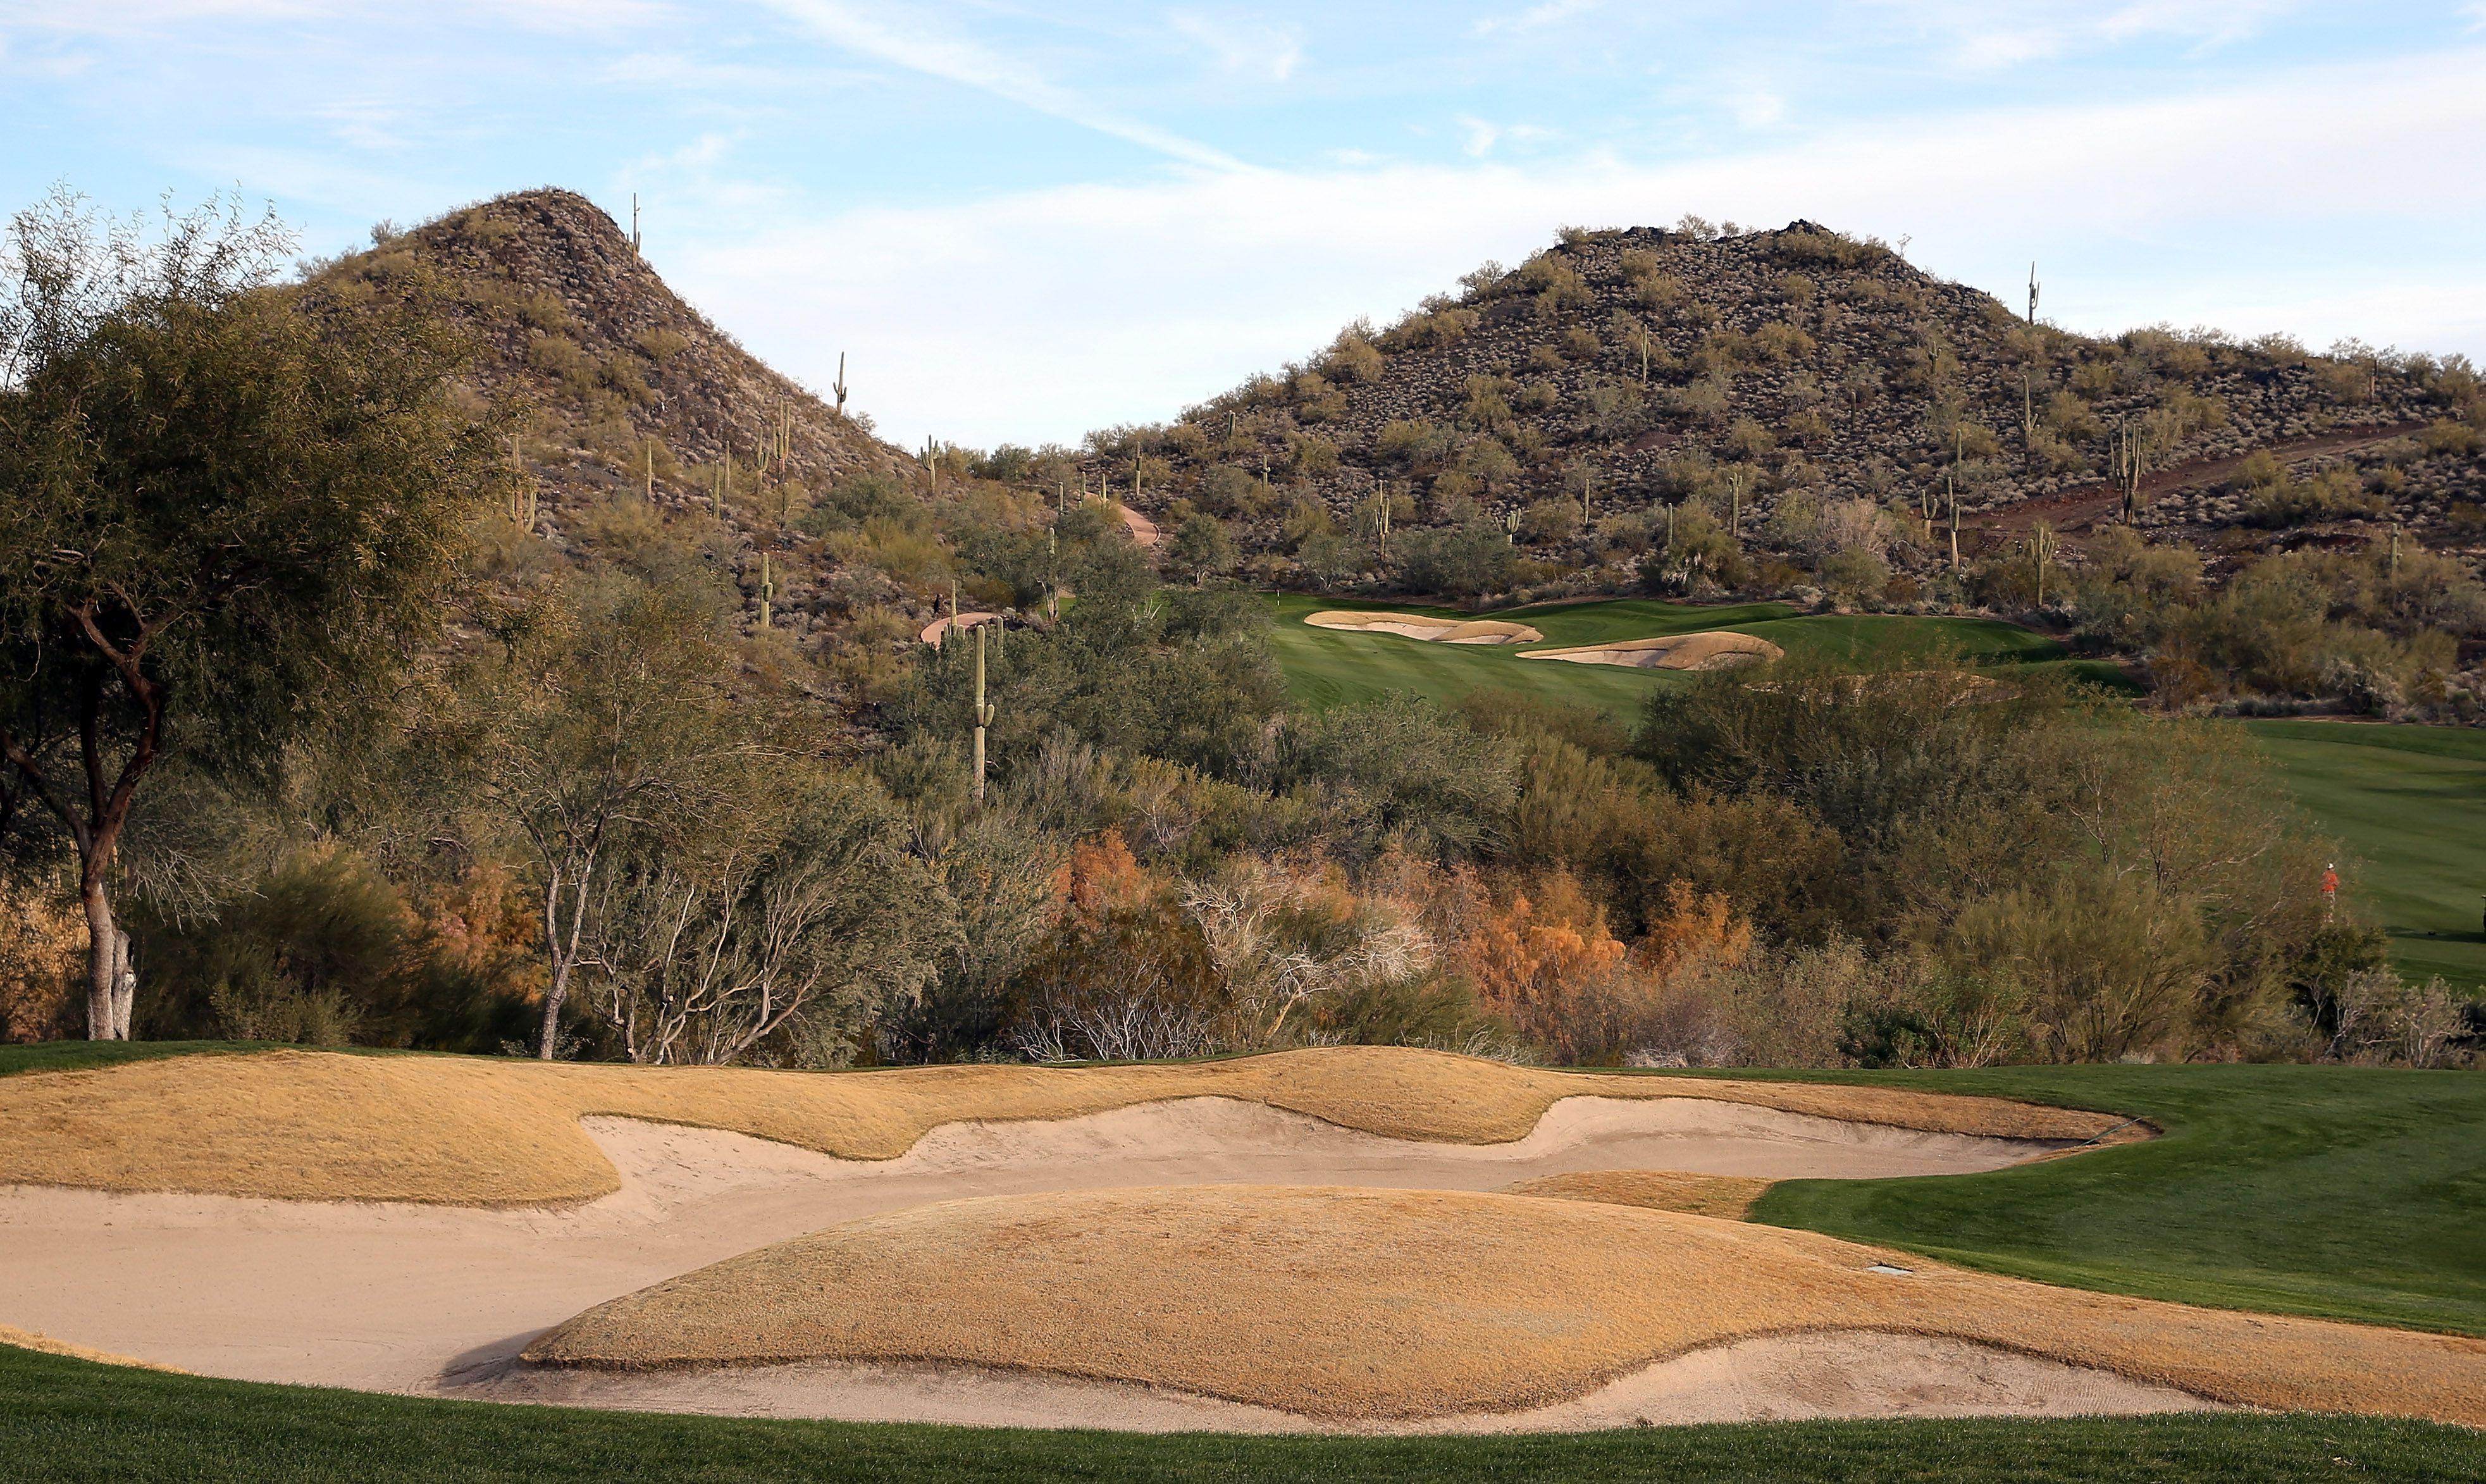 General Views of Arizona Golf Courses